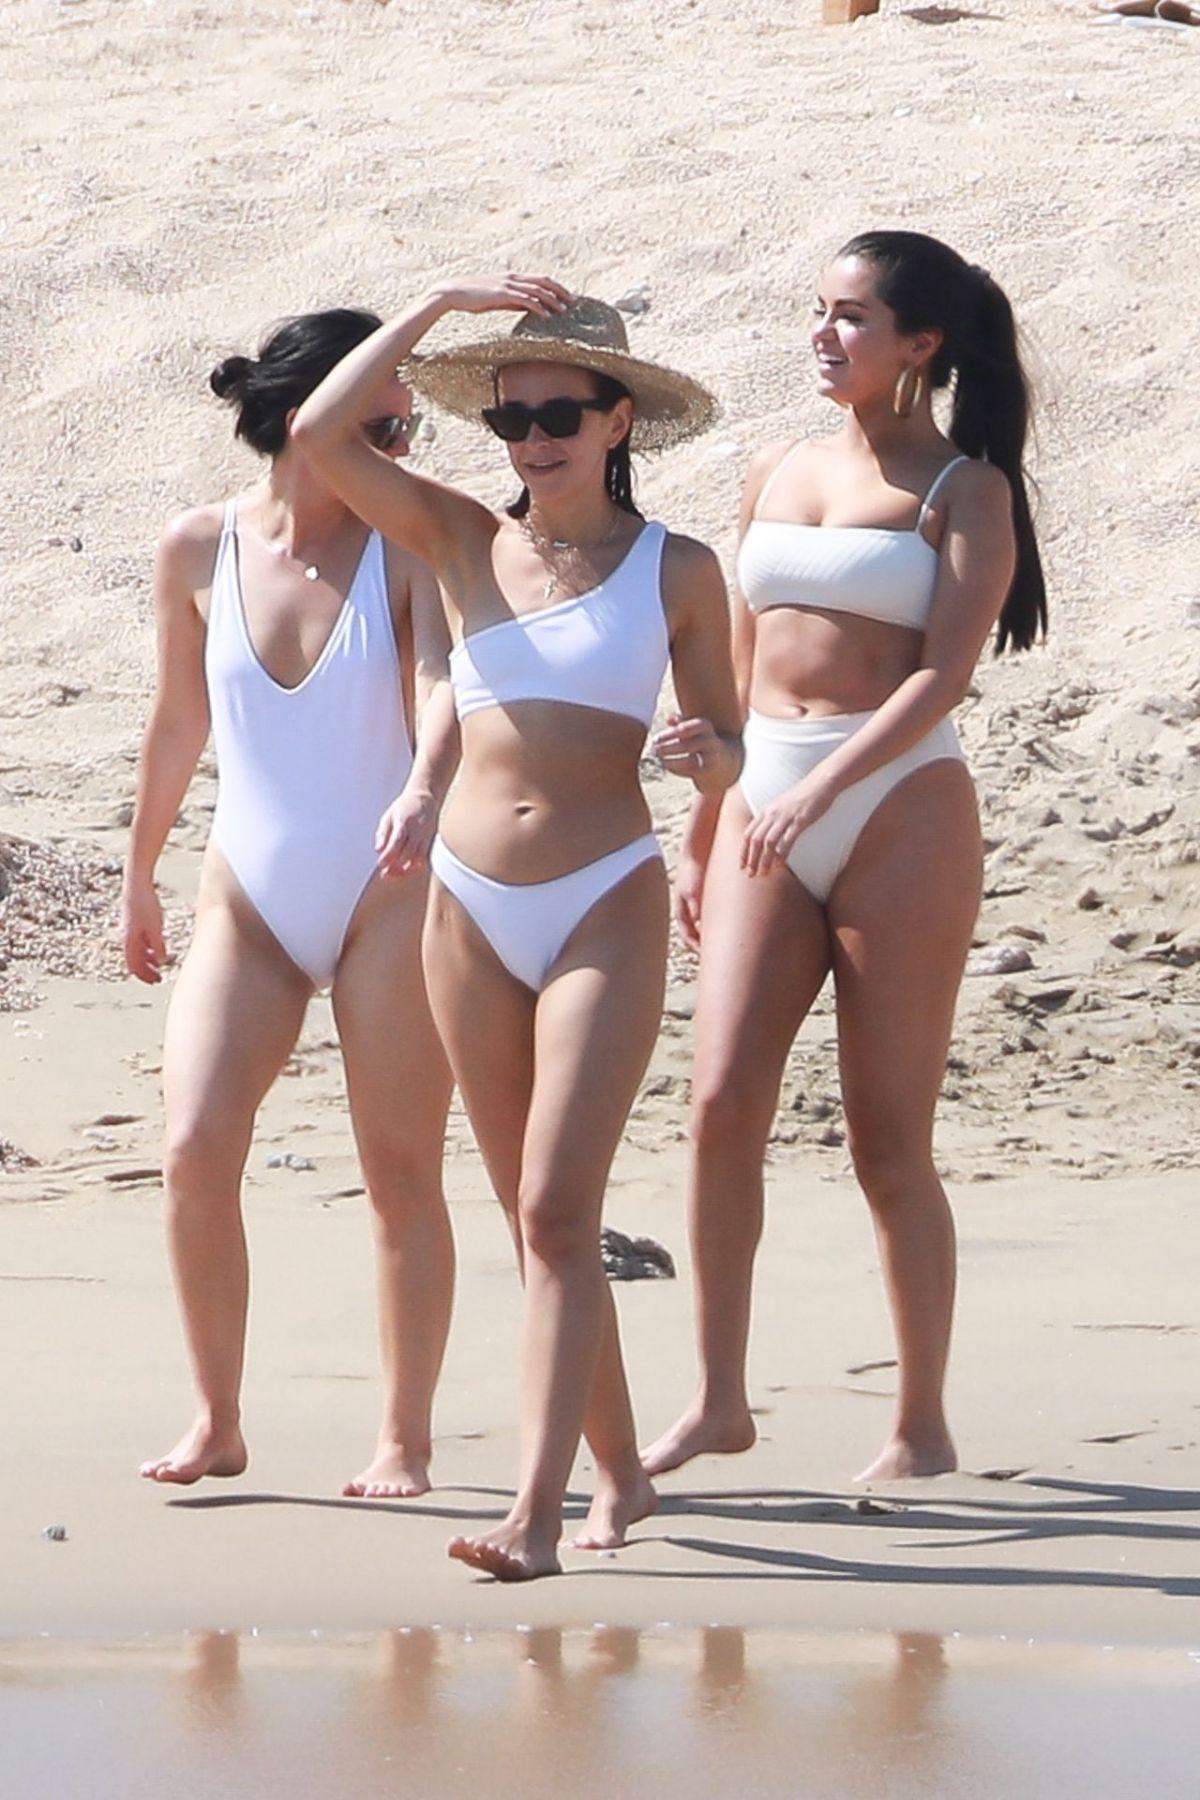 b2fb3dc81 SELENA GOMEZ and Friends in Bikinis at a Beach in Cabo San Lucas 02 ...